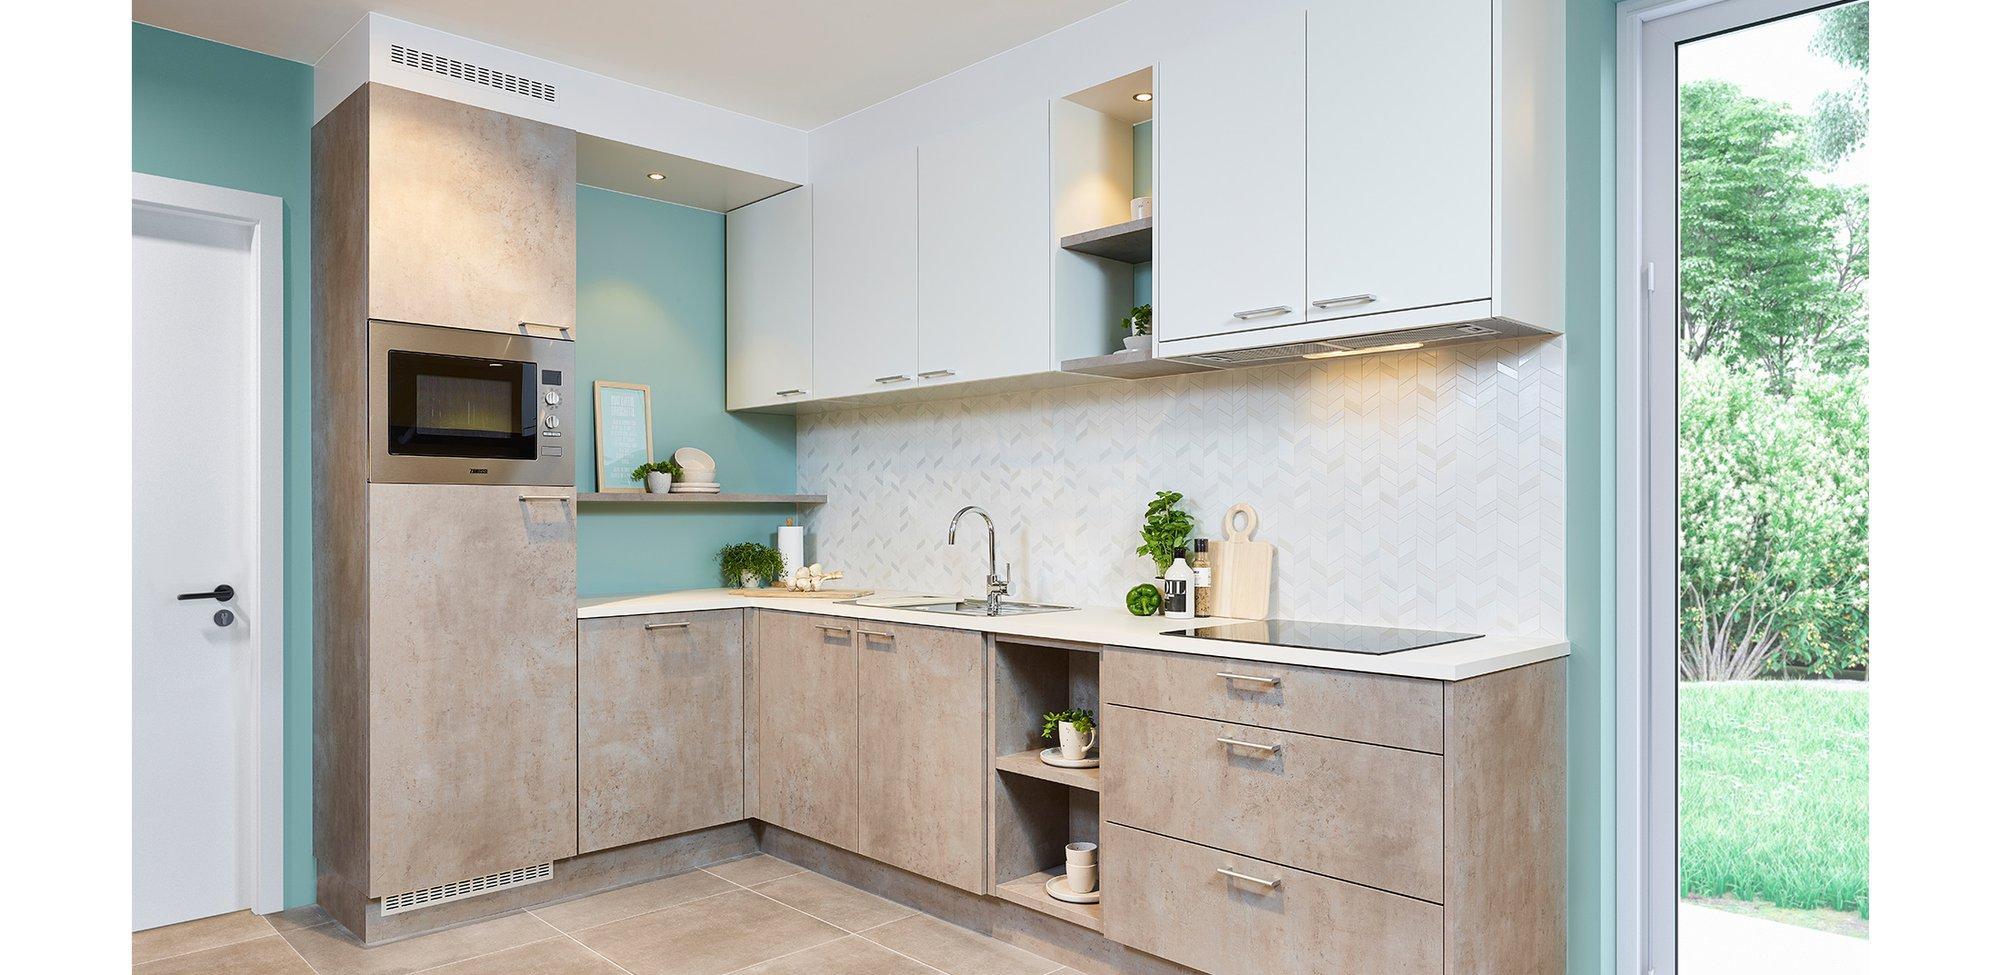 Moderne keuken in betonlook - Model Toronto